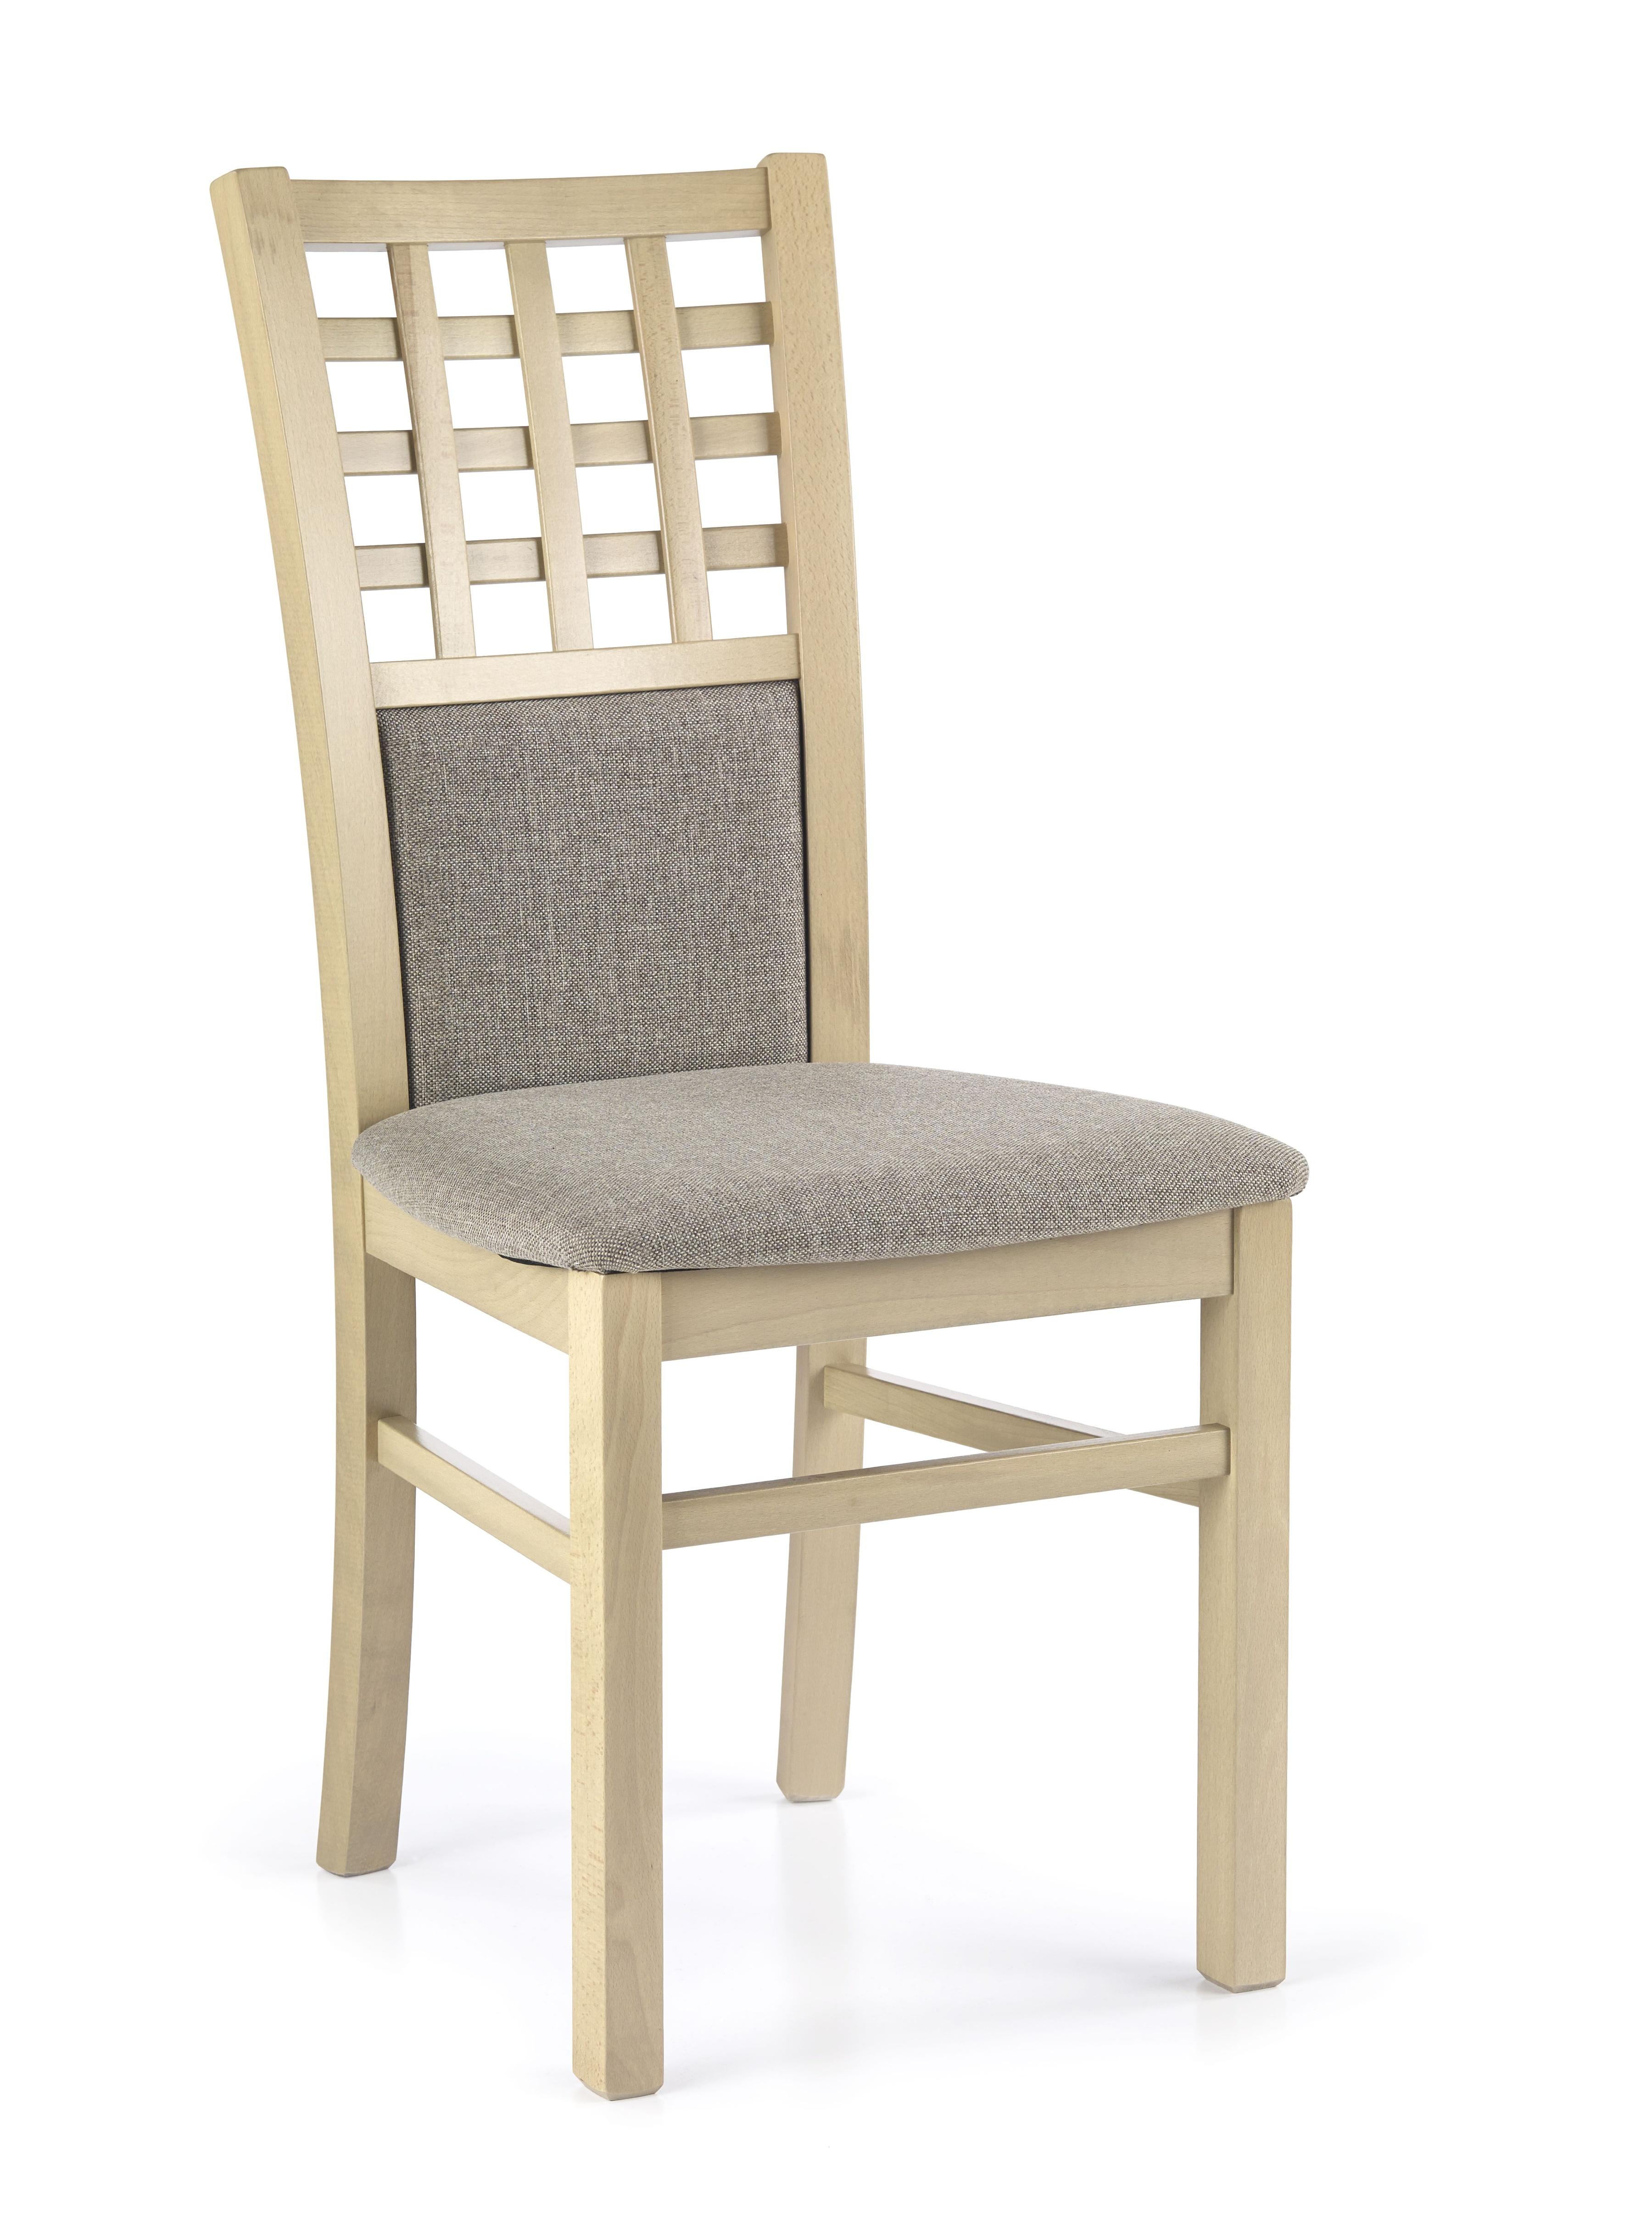 Jídelní židle - Halmar - Gerard 3 Dub Sonoma + Inari 23